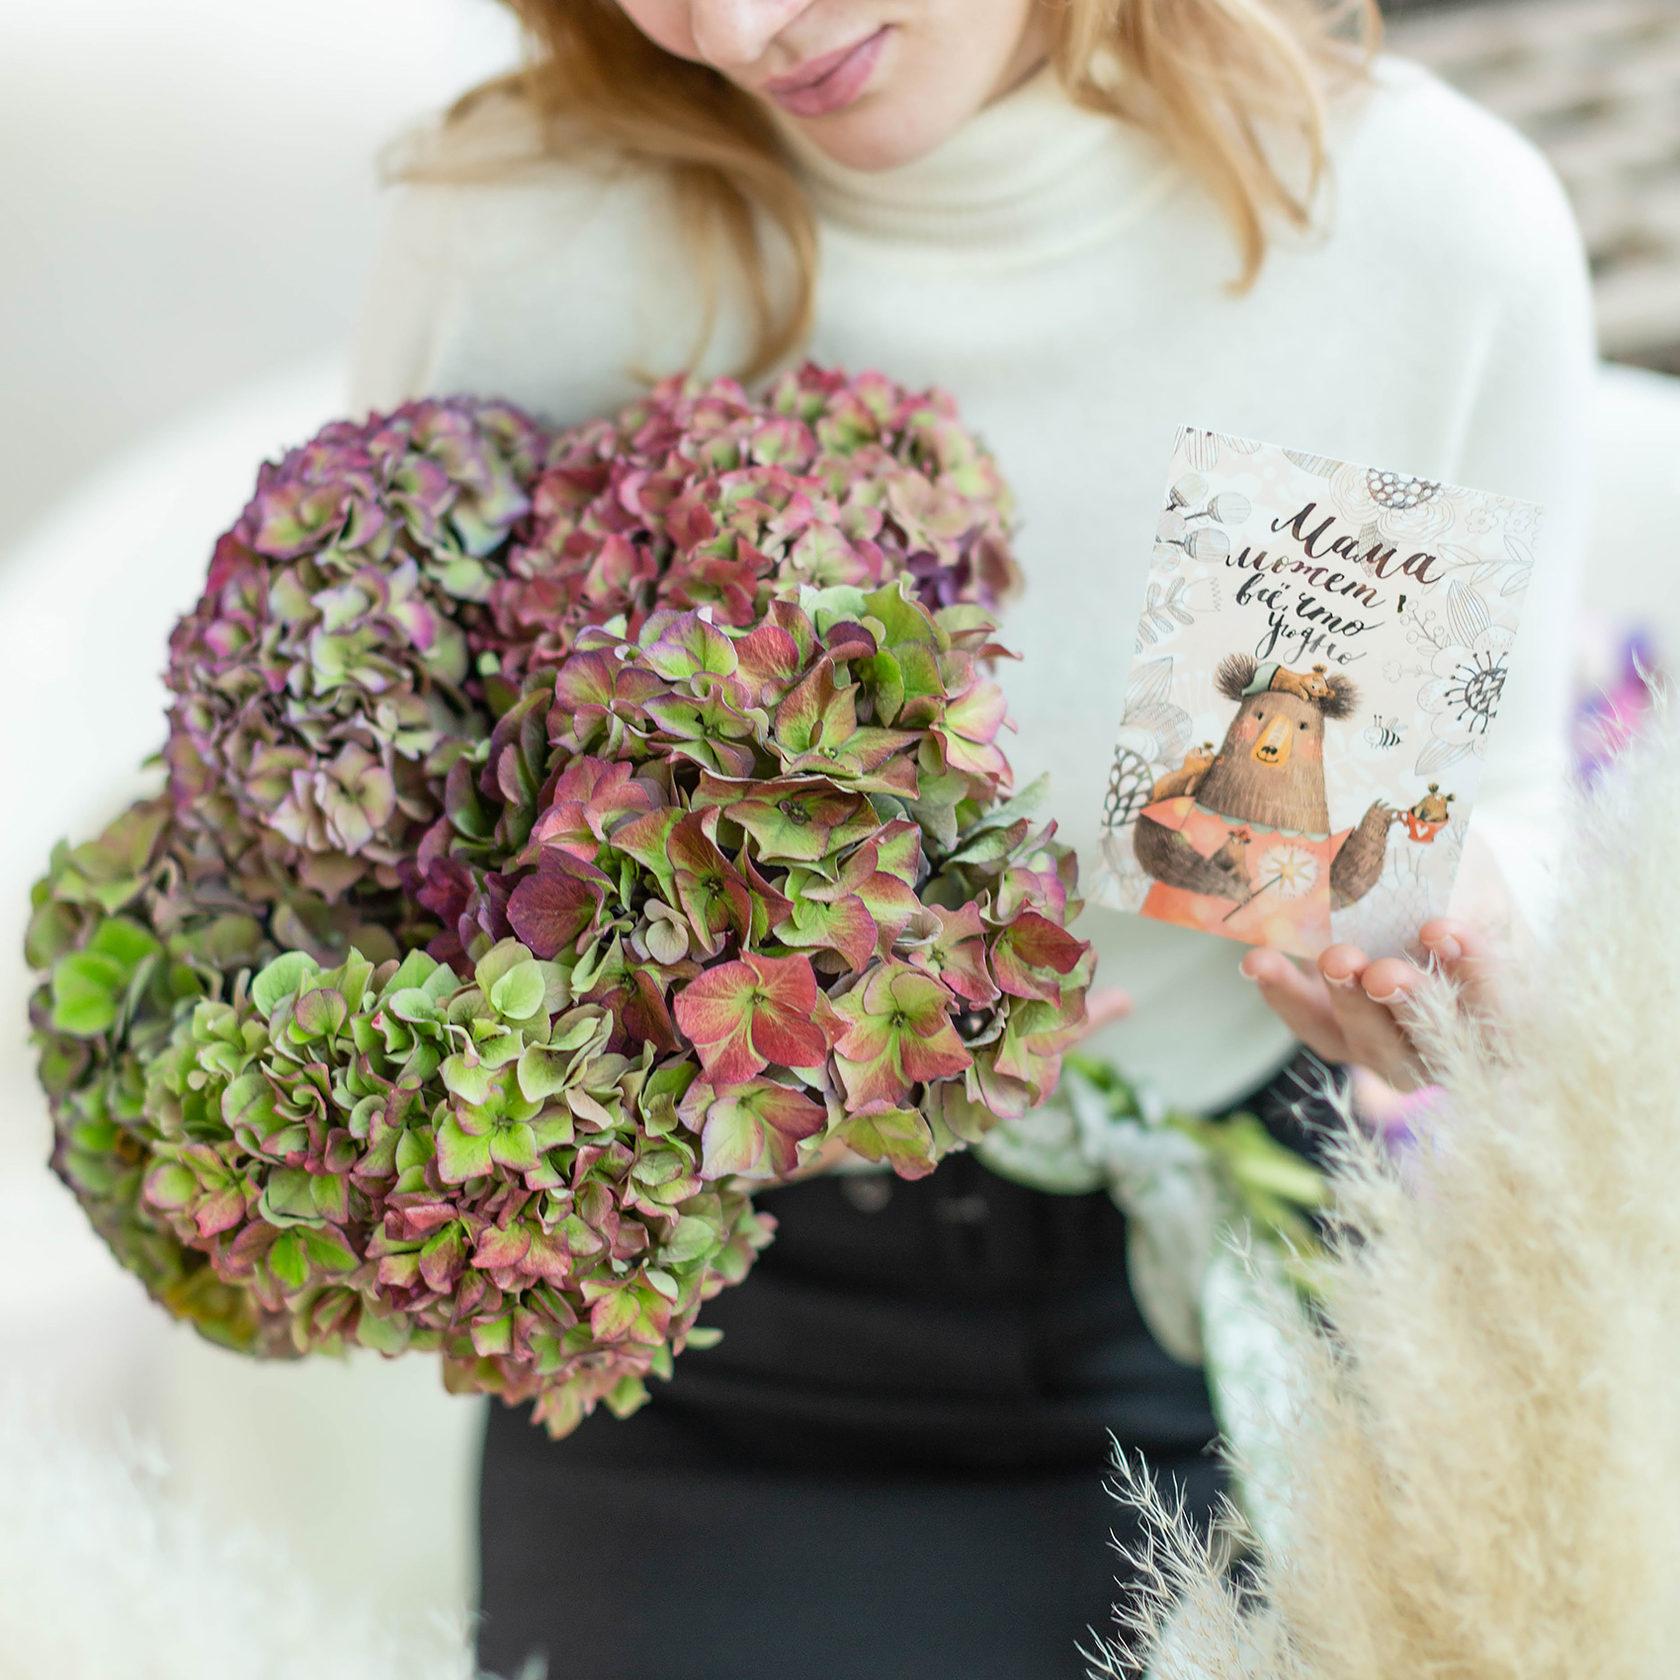 Сколько стоит цветок в вакууме